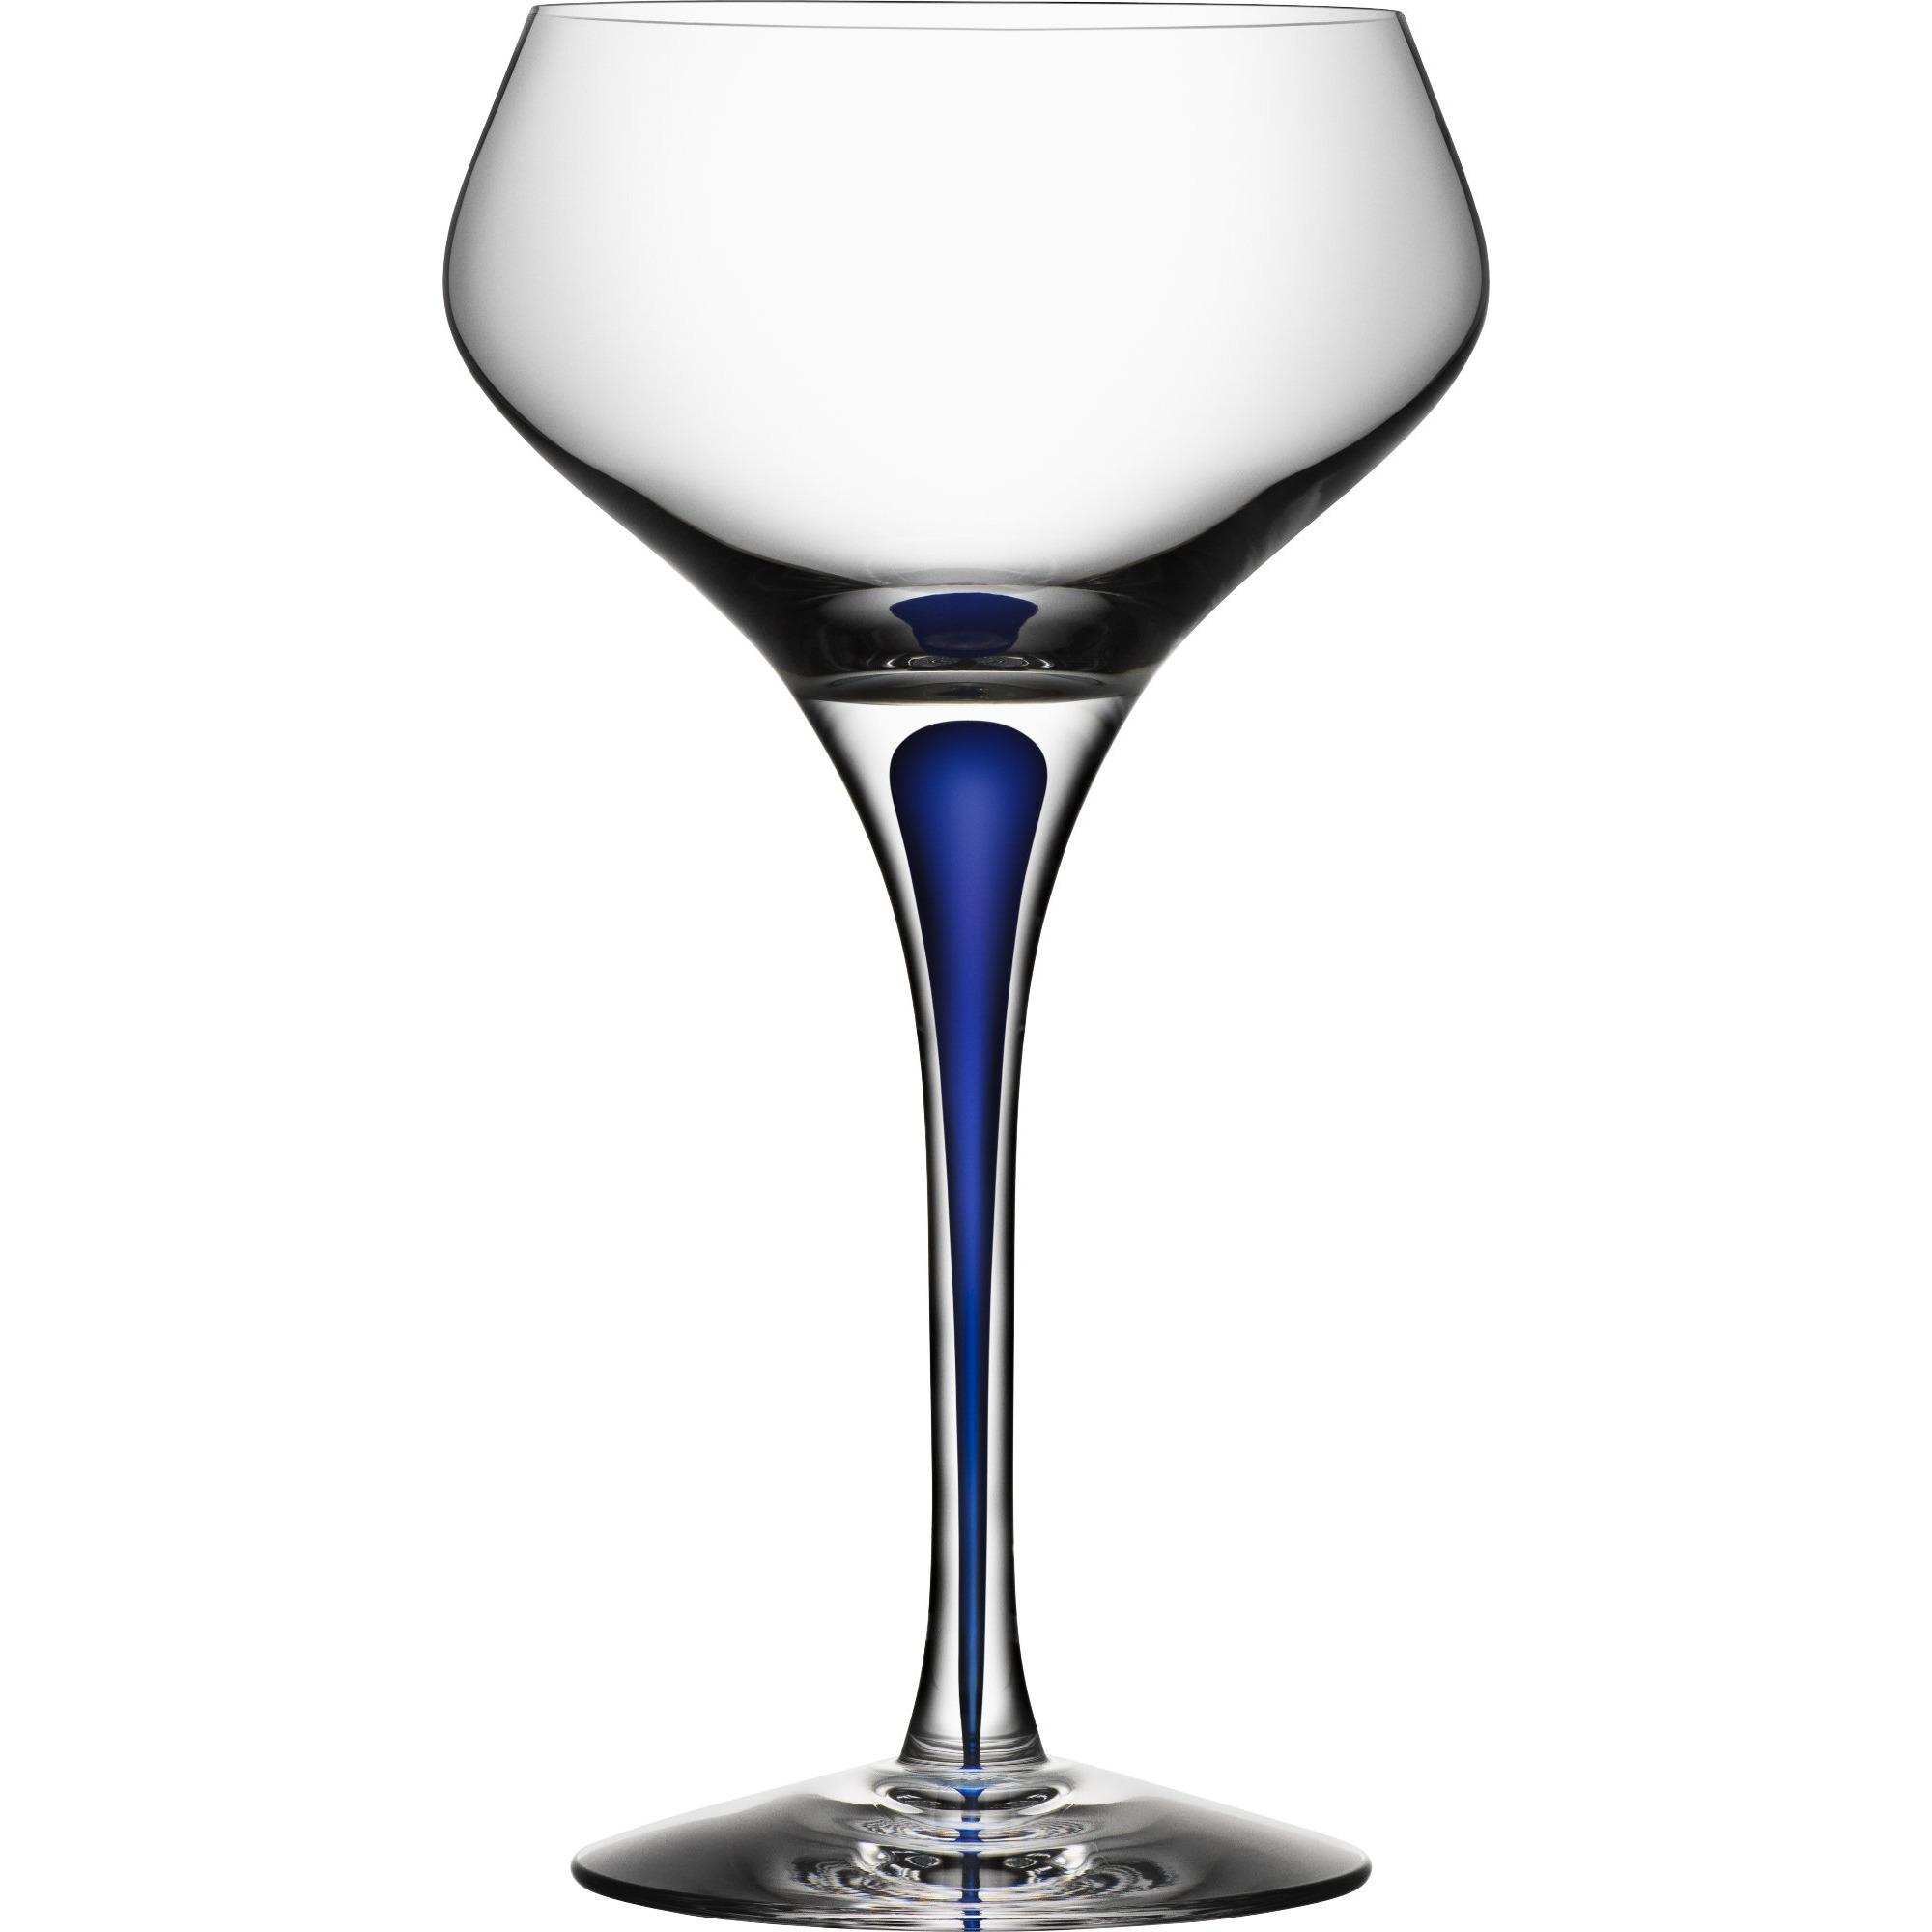 Orrefors Intermezzo Blå Champagne Coupe 29 cl